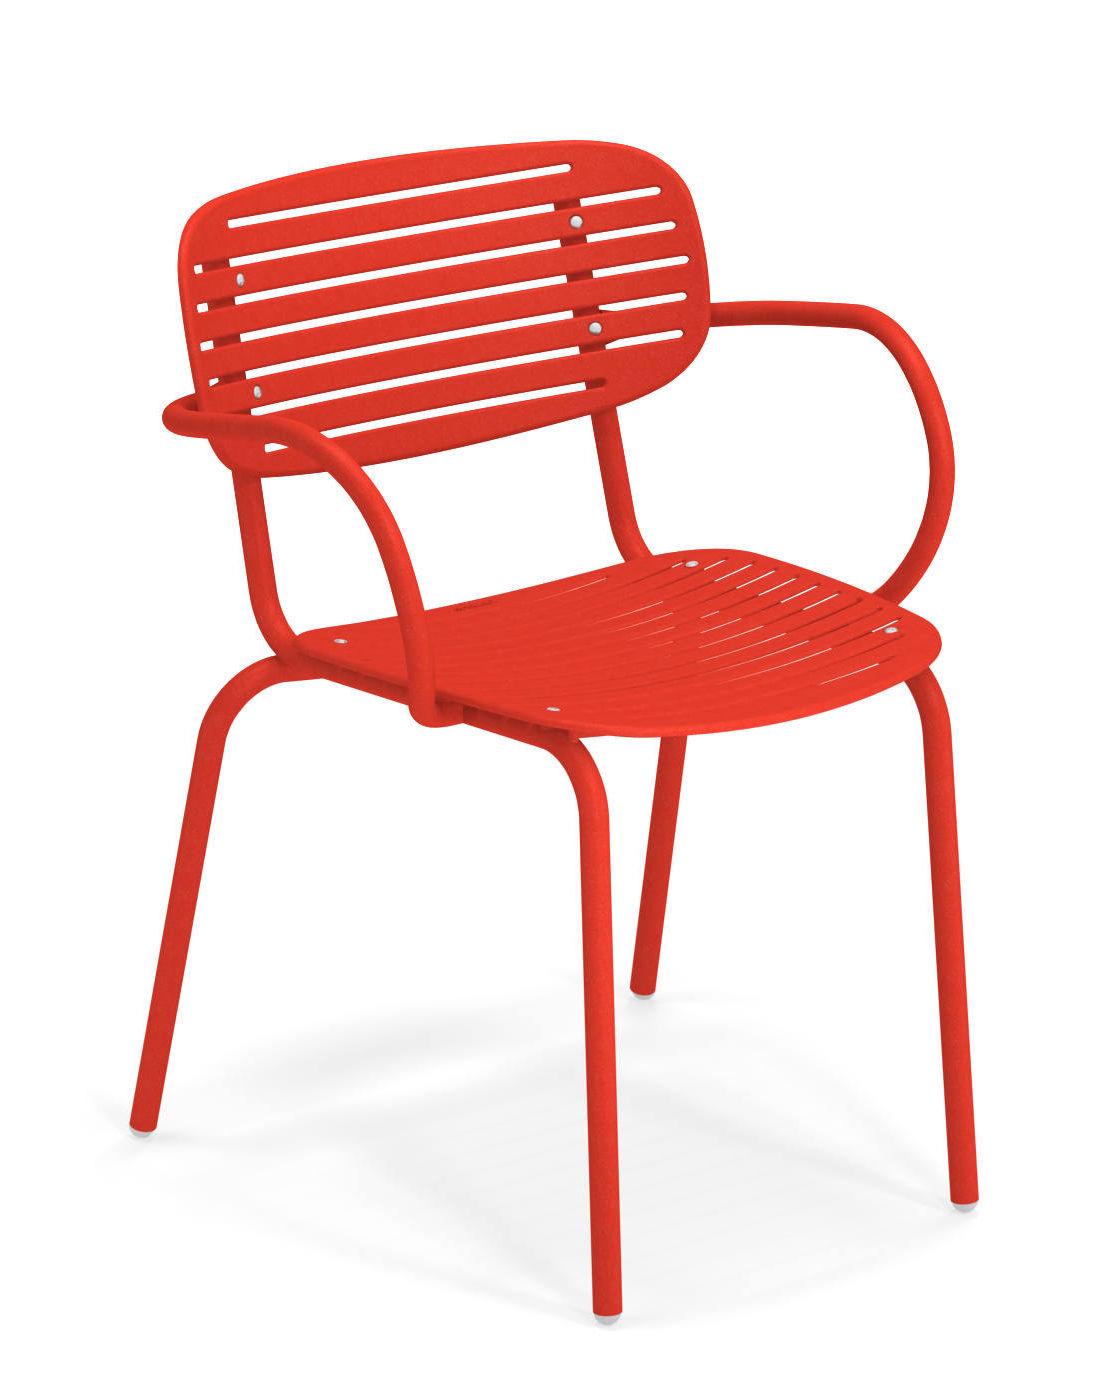 Möbel - Stühle  - Mom Stapelbarer Sessel / Metall - Emu - Rot - gefirnister Stahl